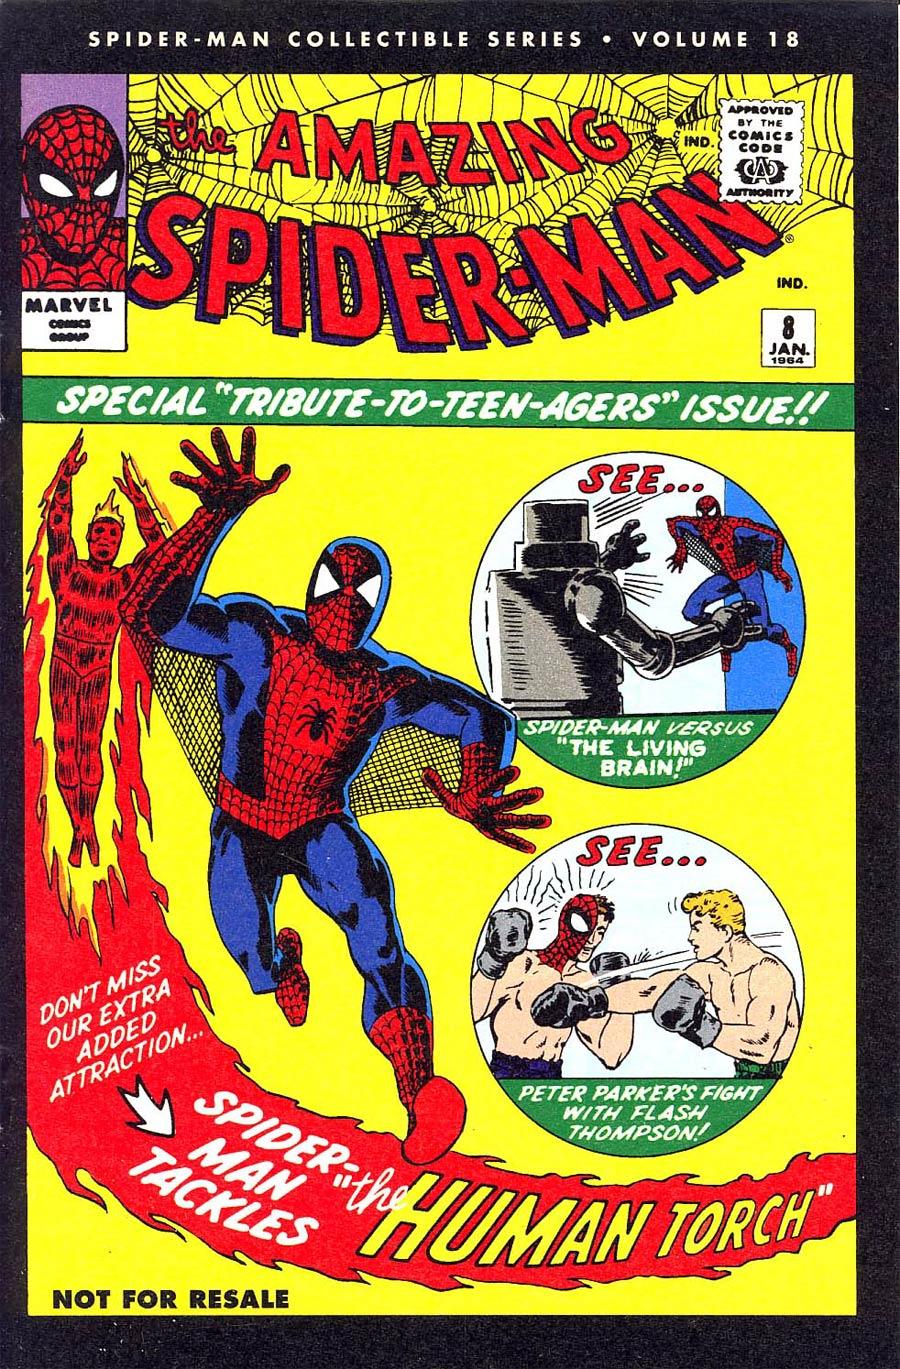 Spider-Man Collectible Series #18